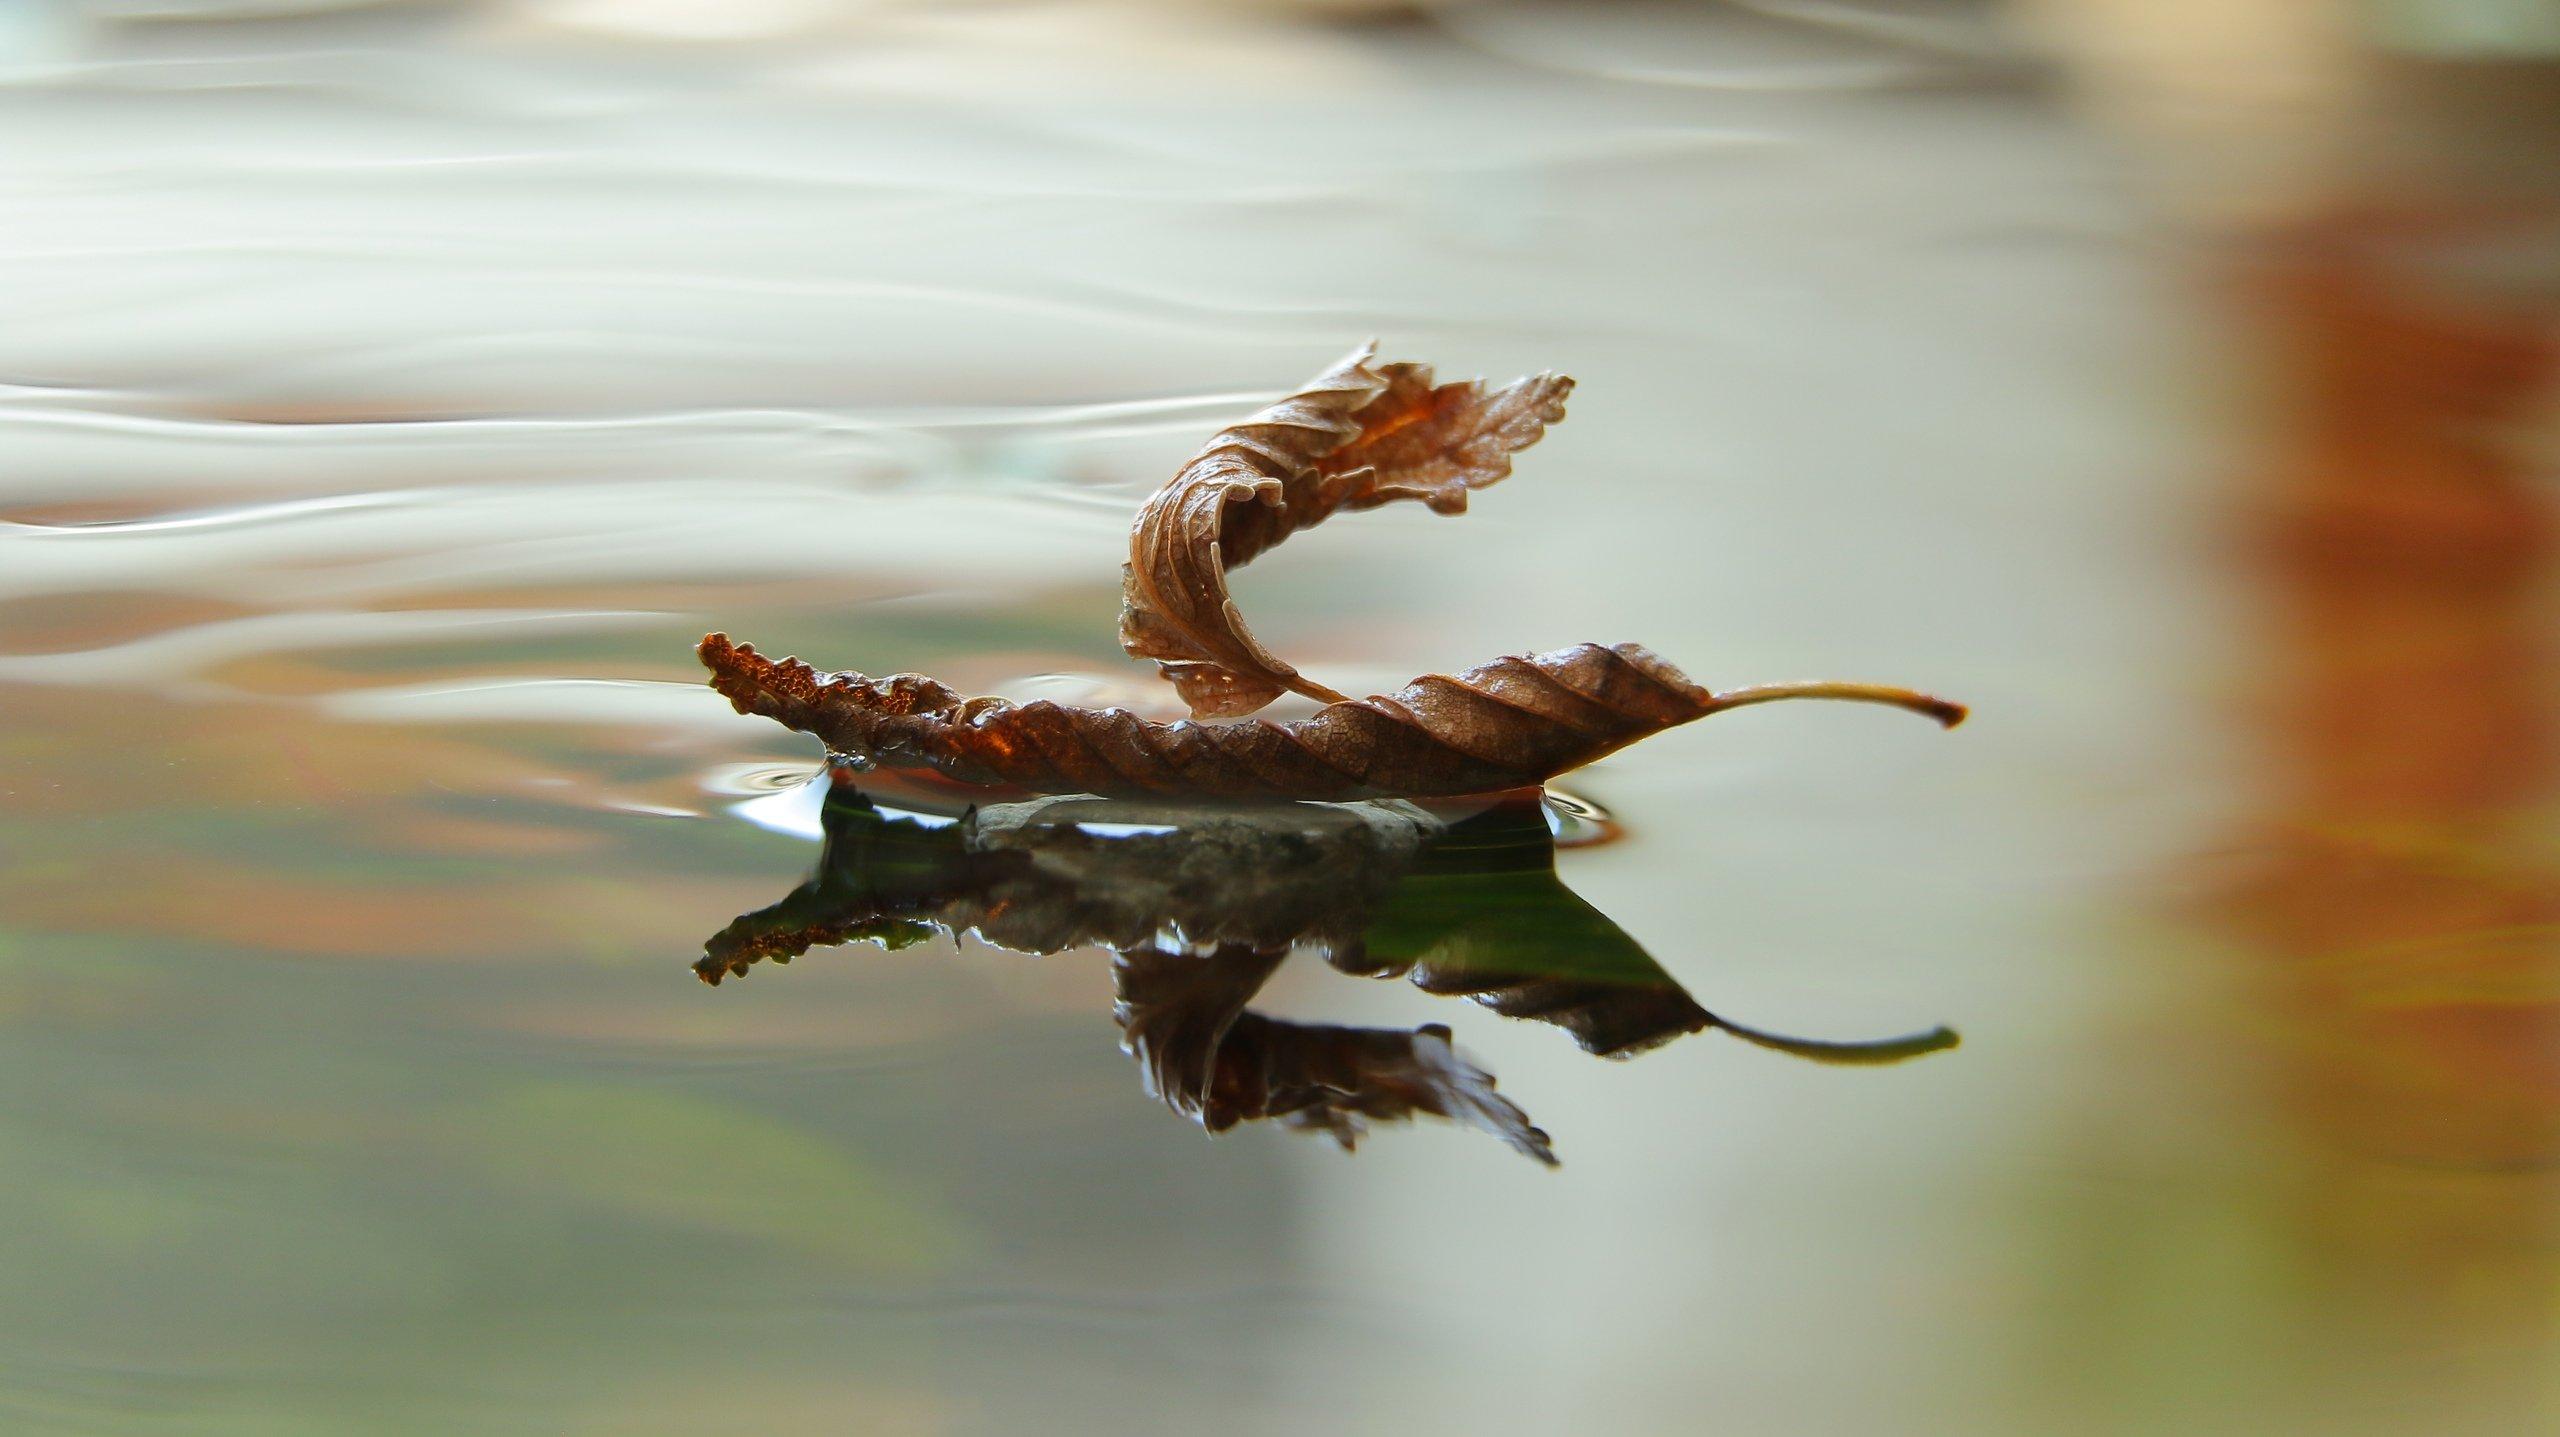 шаварёв, макро, природа, арт, фотография,, Шаварёв Александр